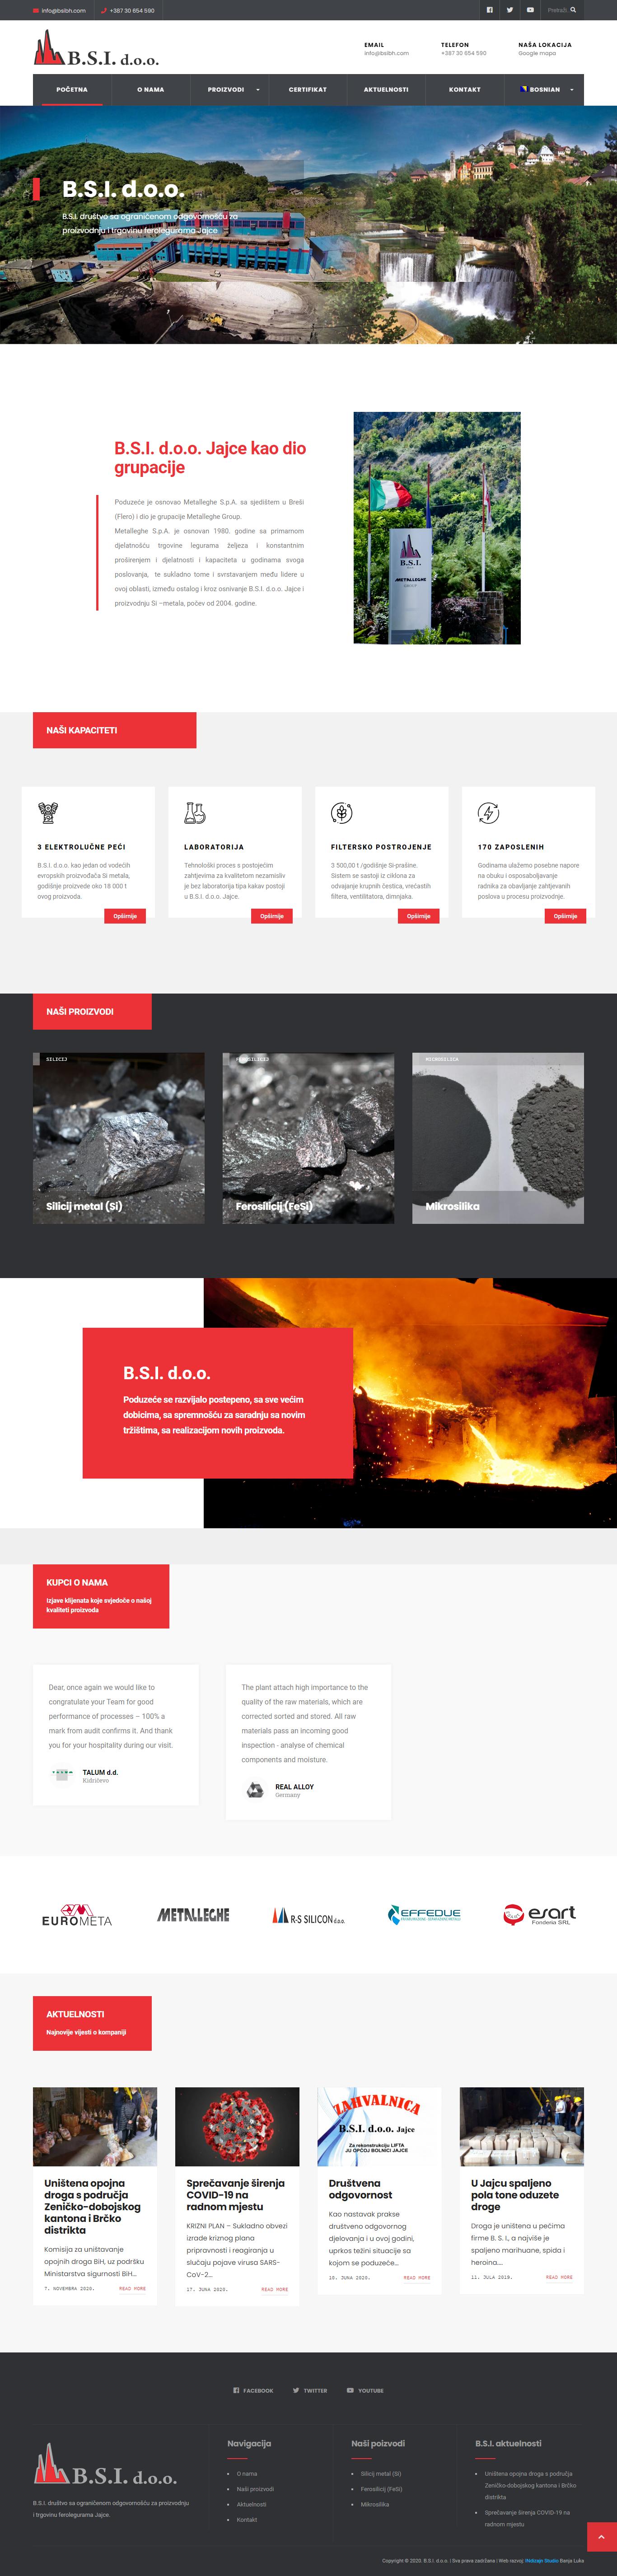 screencapture-bsibh-INdizajn-Studio-izrada-web-stranica-i-graficki-dizajn-FULL-SITE